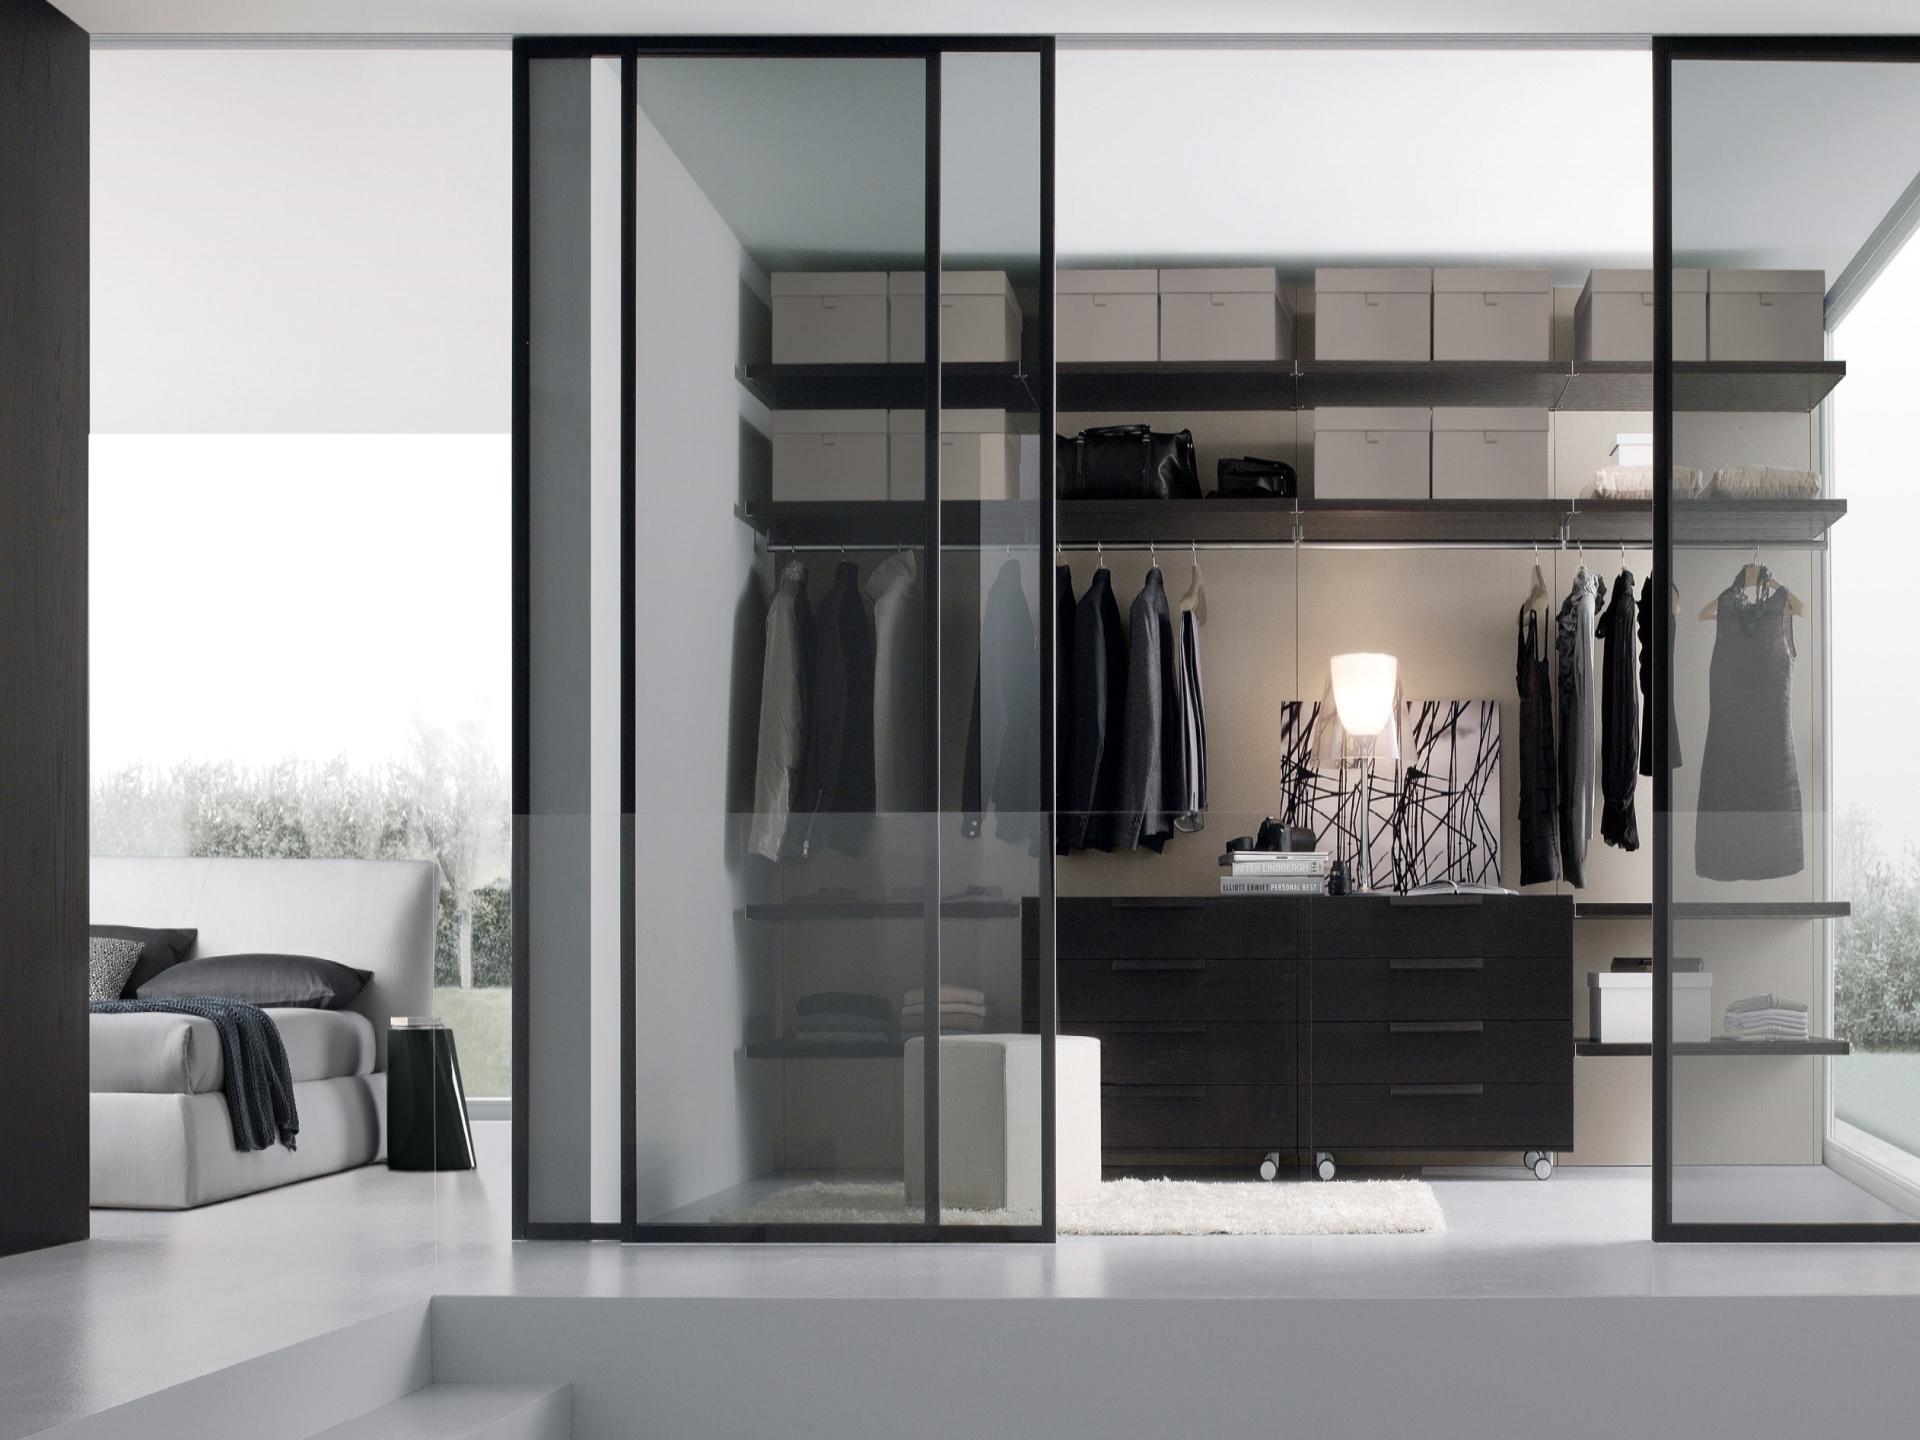 creer son dressing affordable rgles connatre pour crer des rangements with creer son dressing. Black Bedroom Furniture Sets. Home Design Ideas